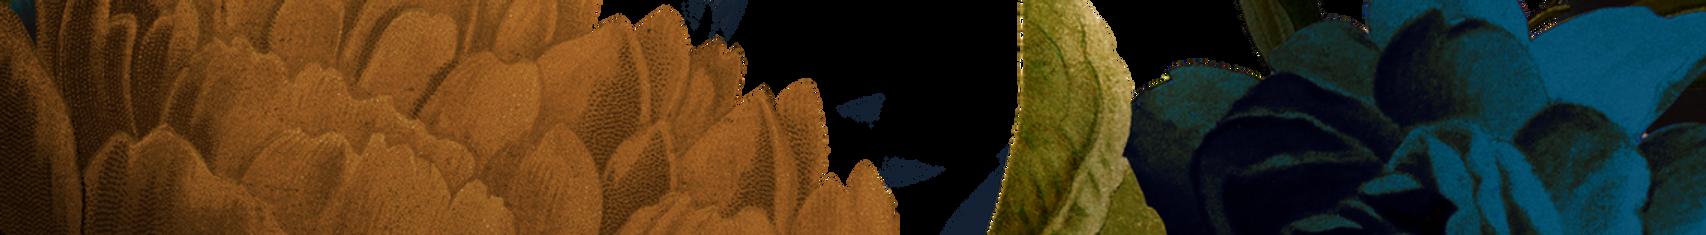 botanical_group3.png